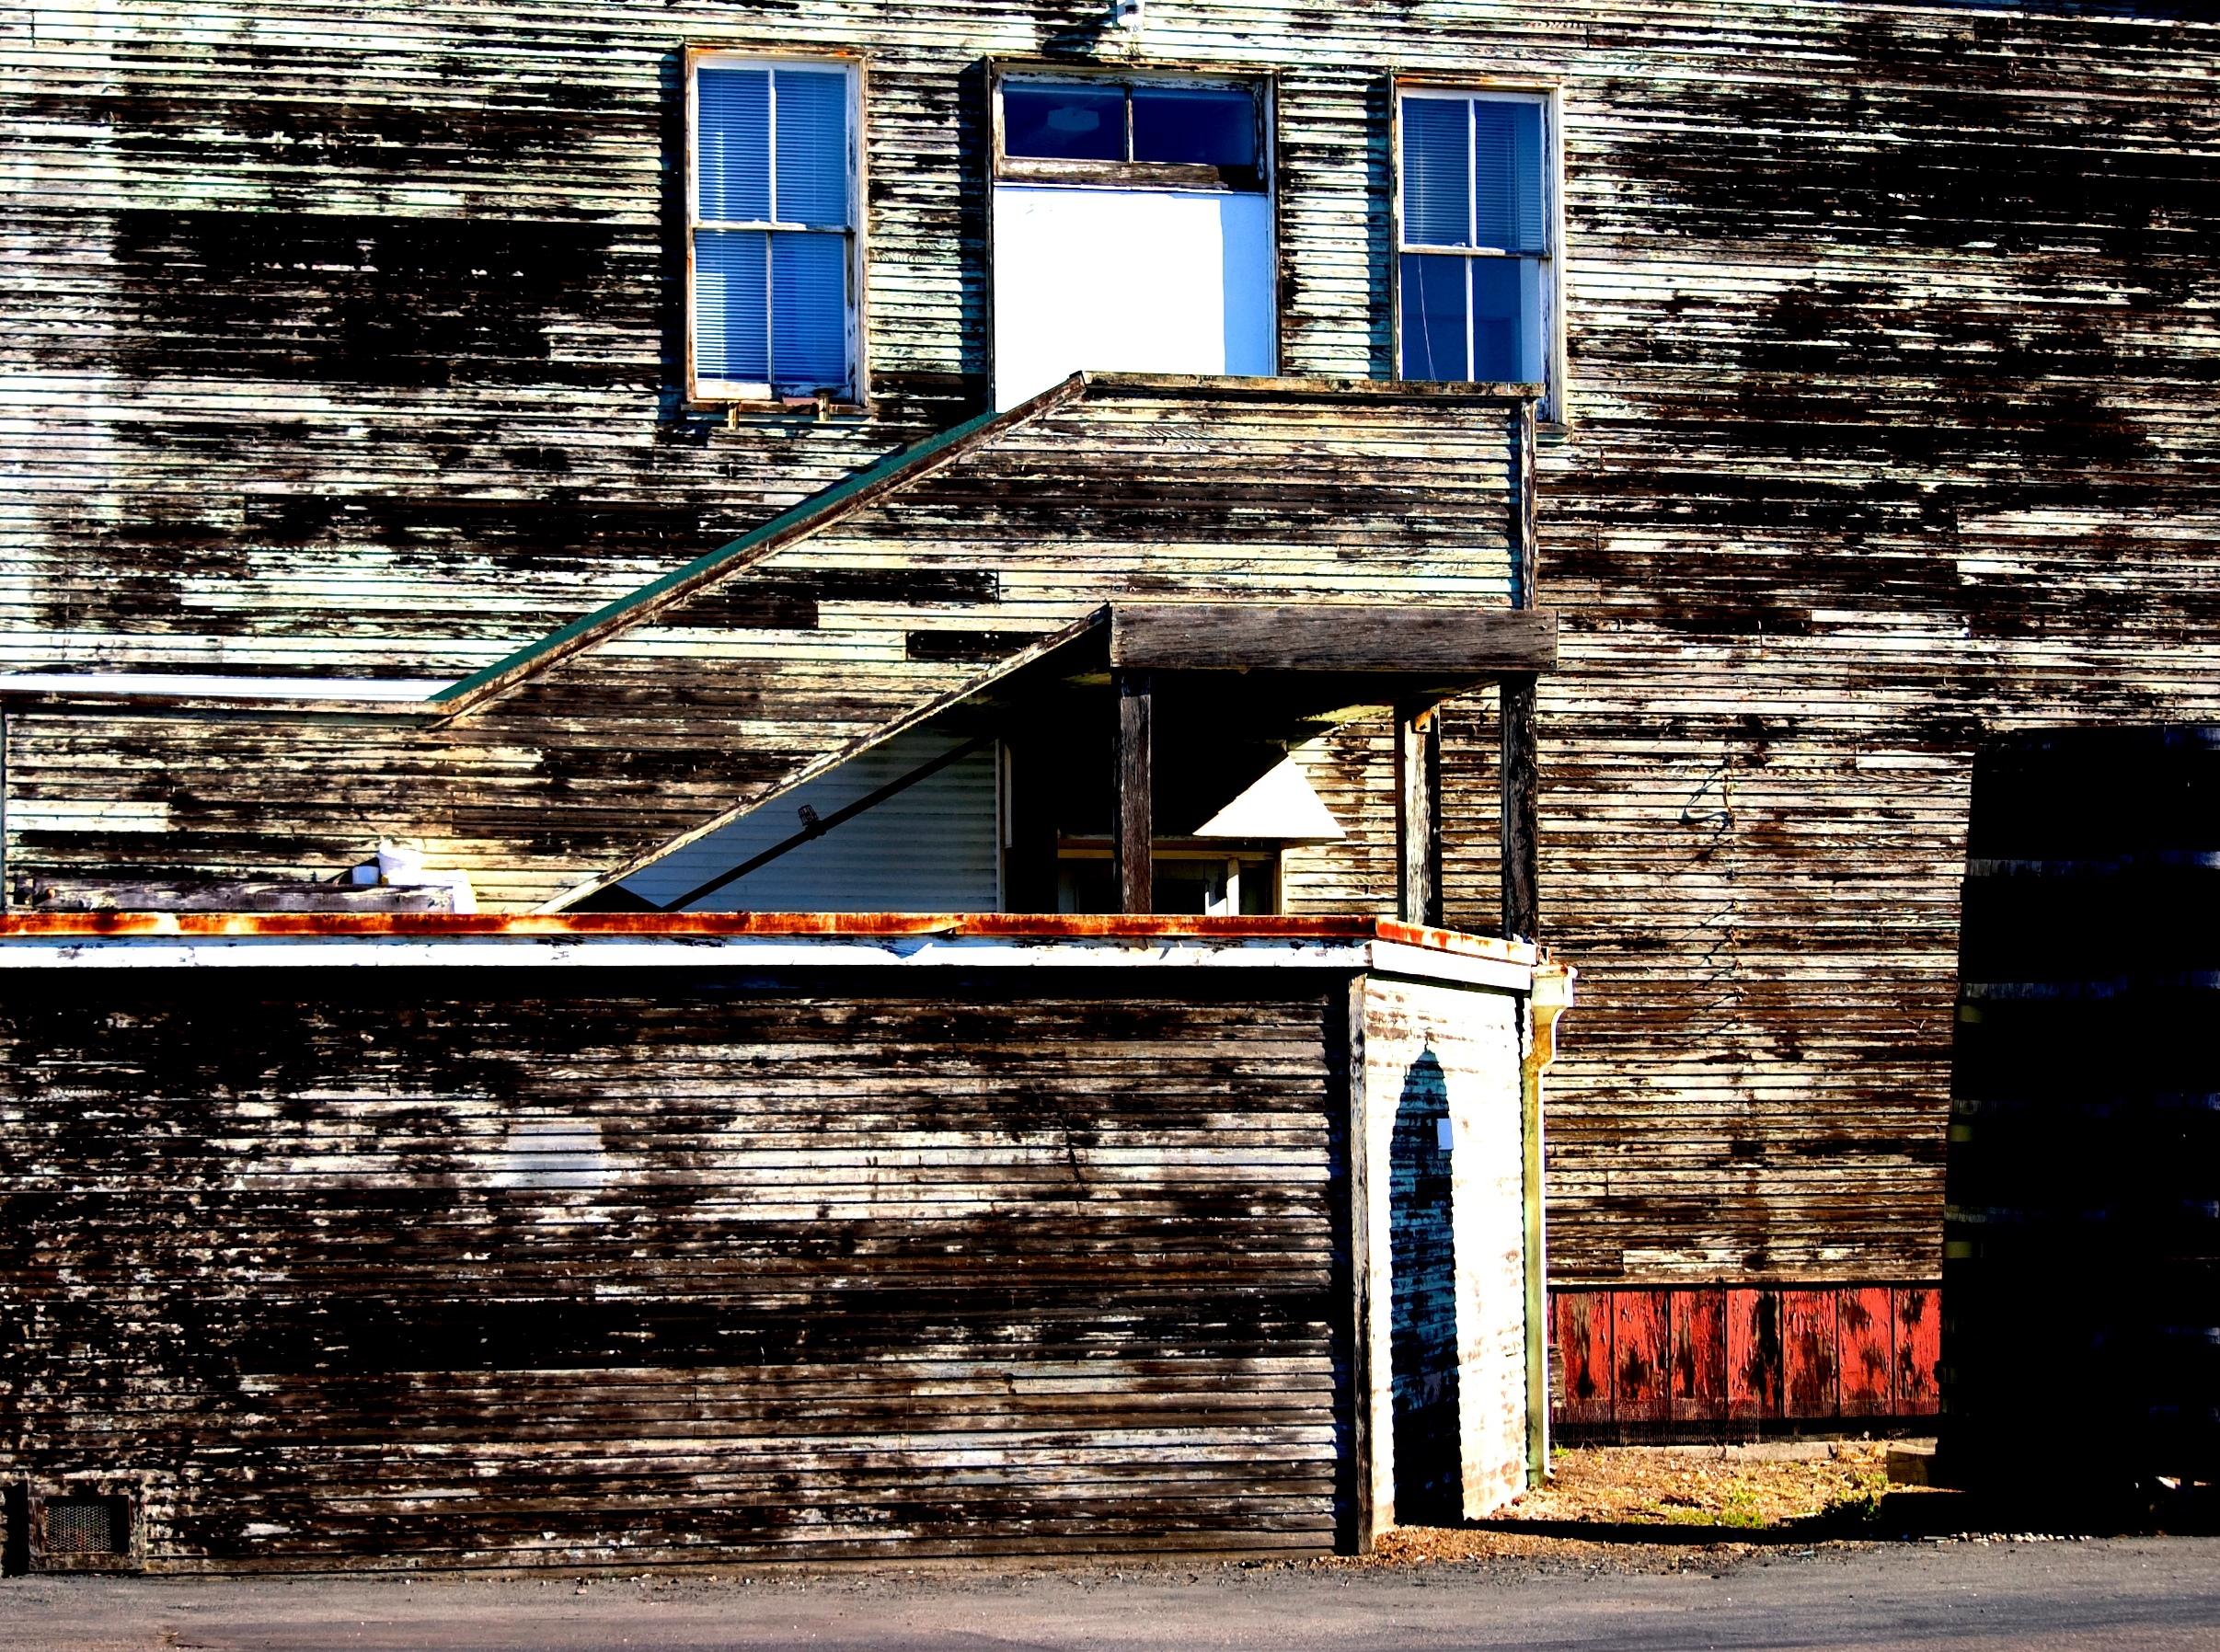 green peel building 14x11-2.jpg